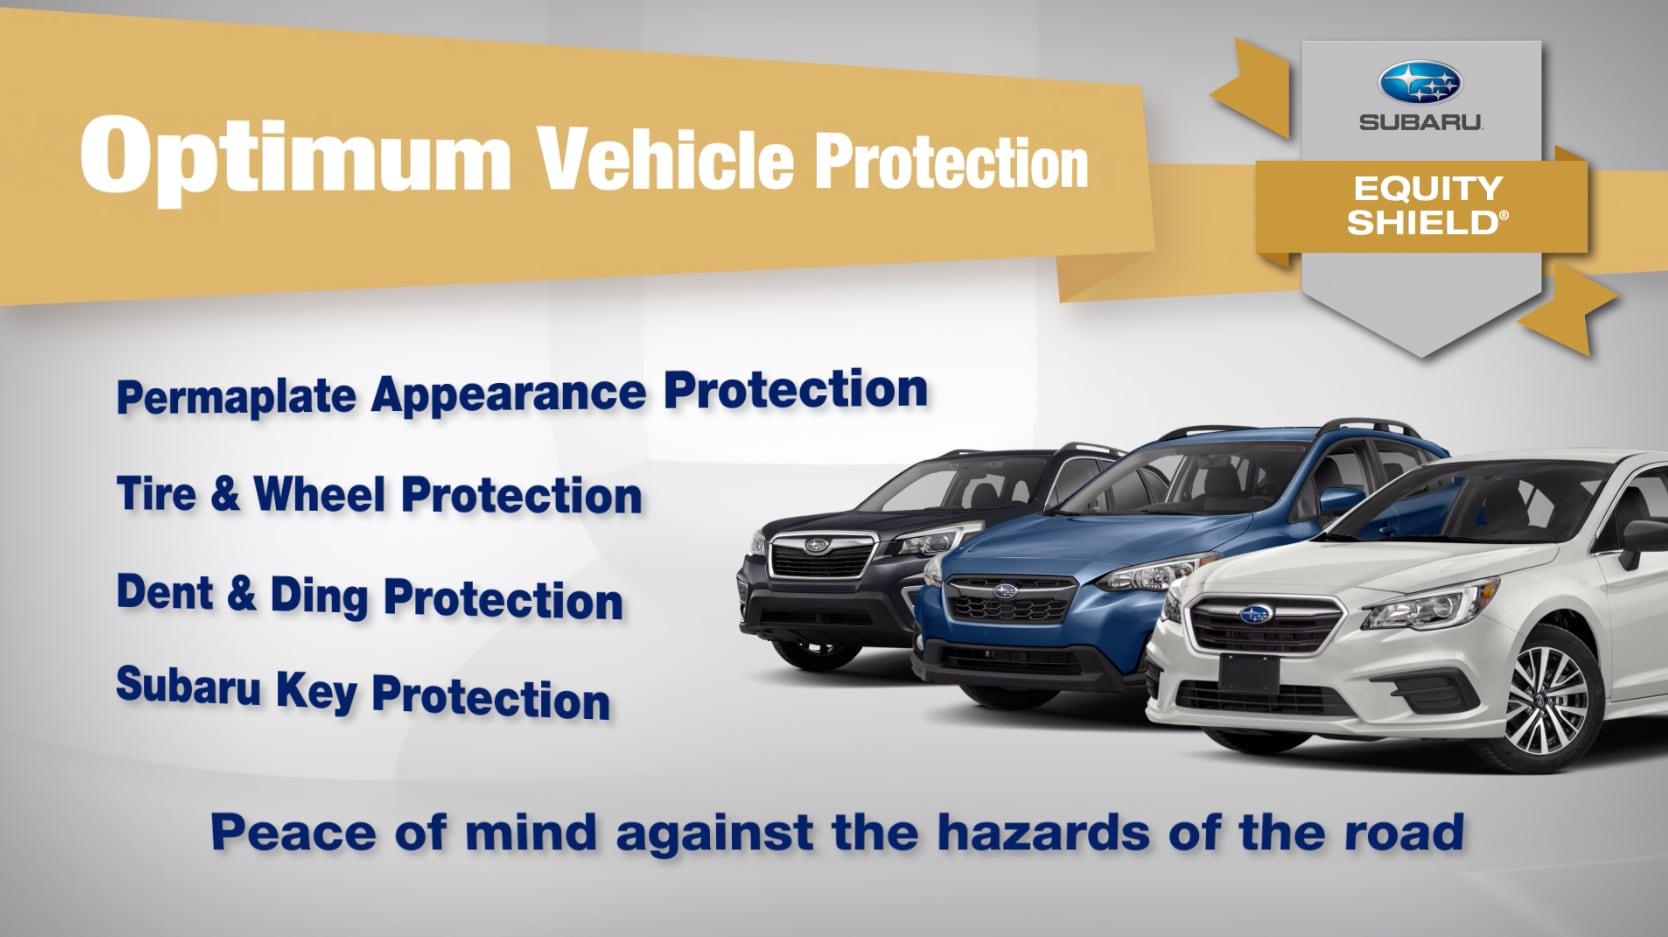 Subaru Equity Shield Vehicle Protection Tire Wheel Dent